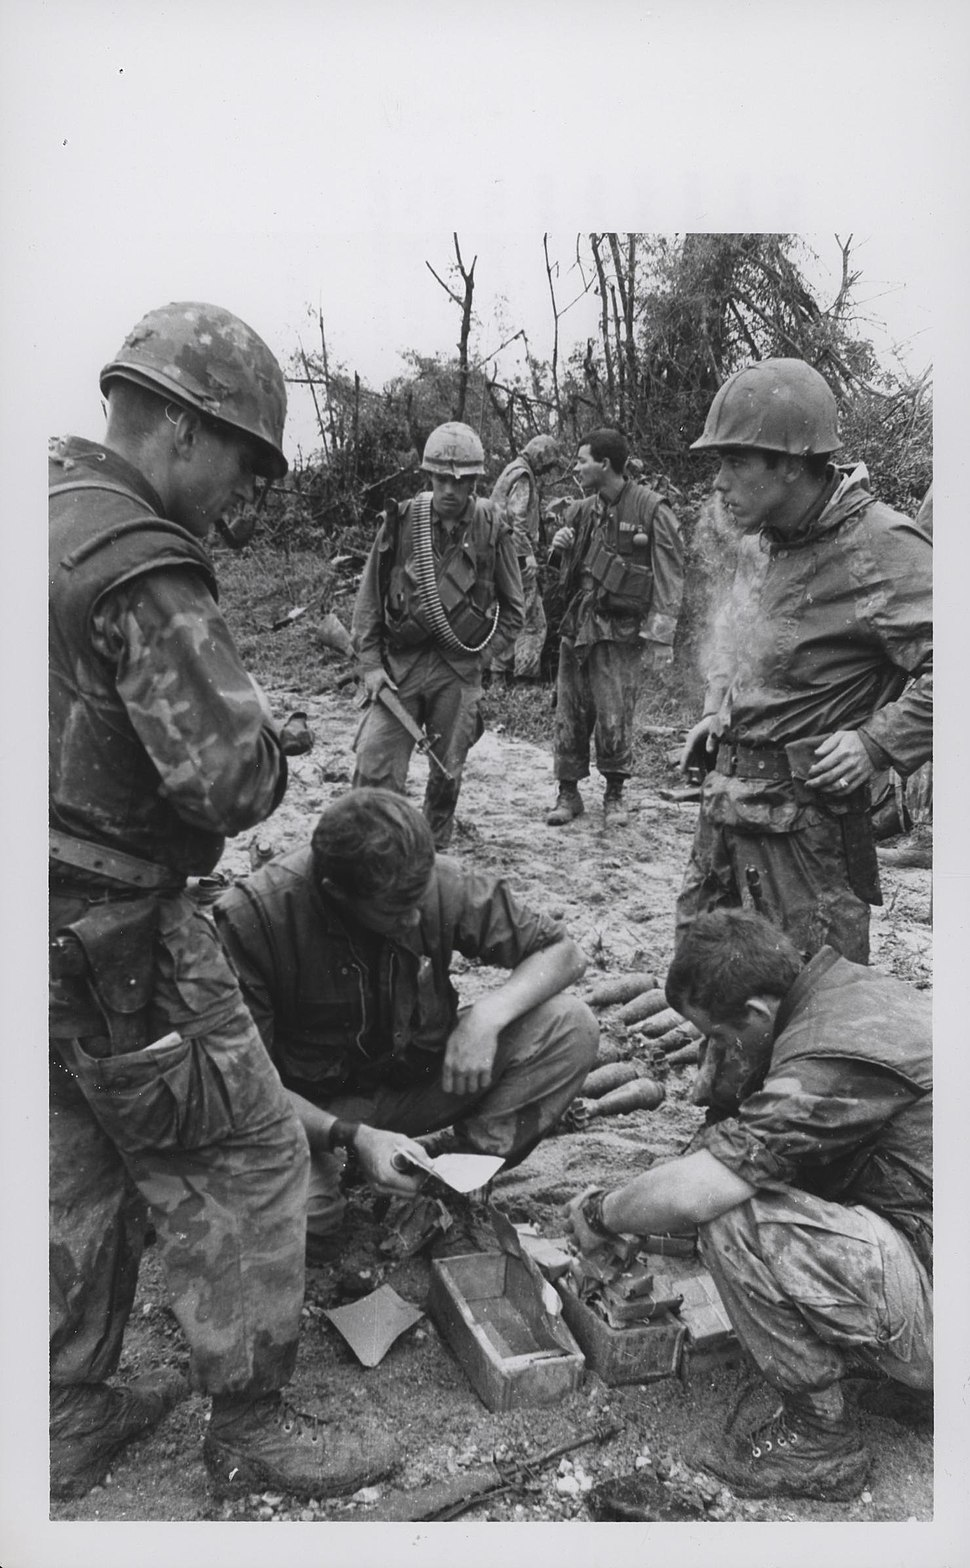 Marines Inspect Enemy Ammunition, 1969 (20524088458)